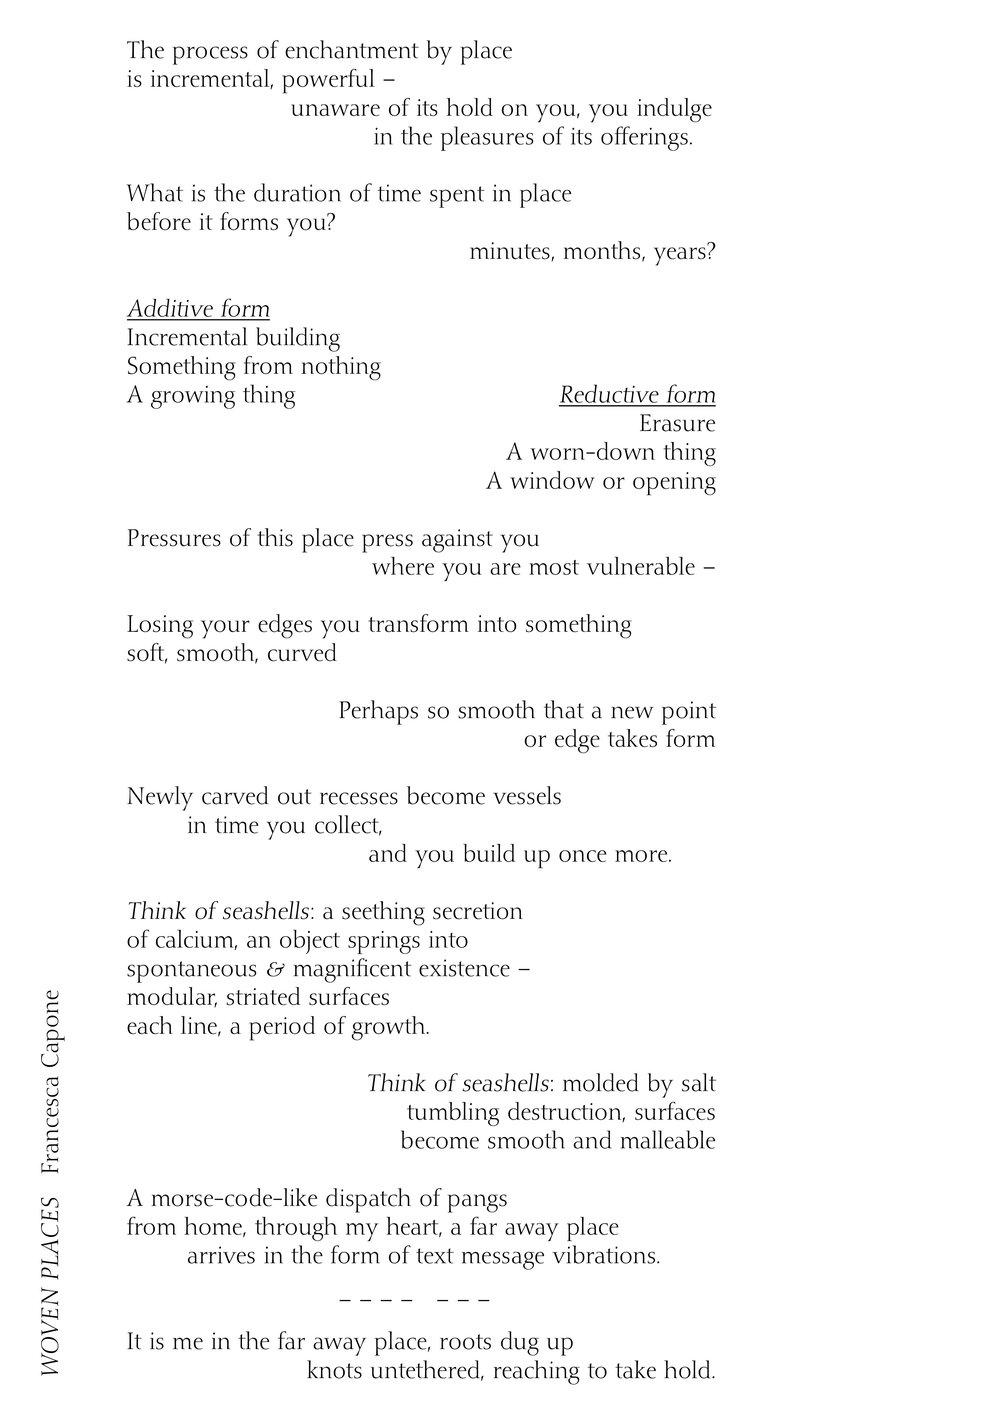 poem_Francesca Capone (1).jpg